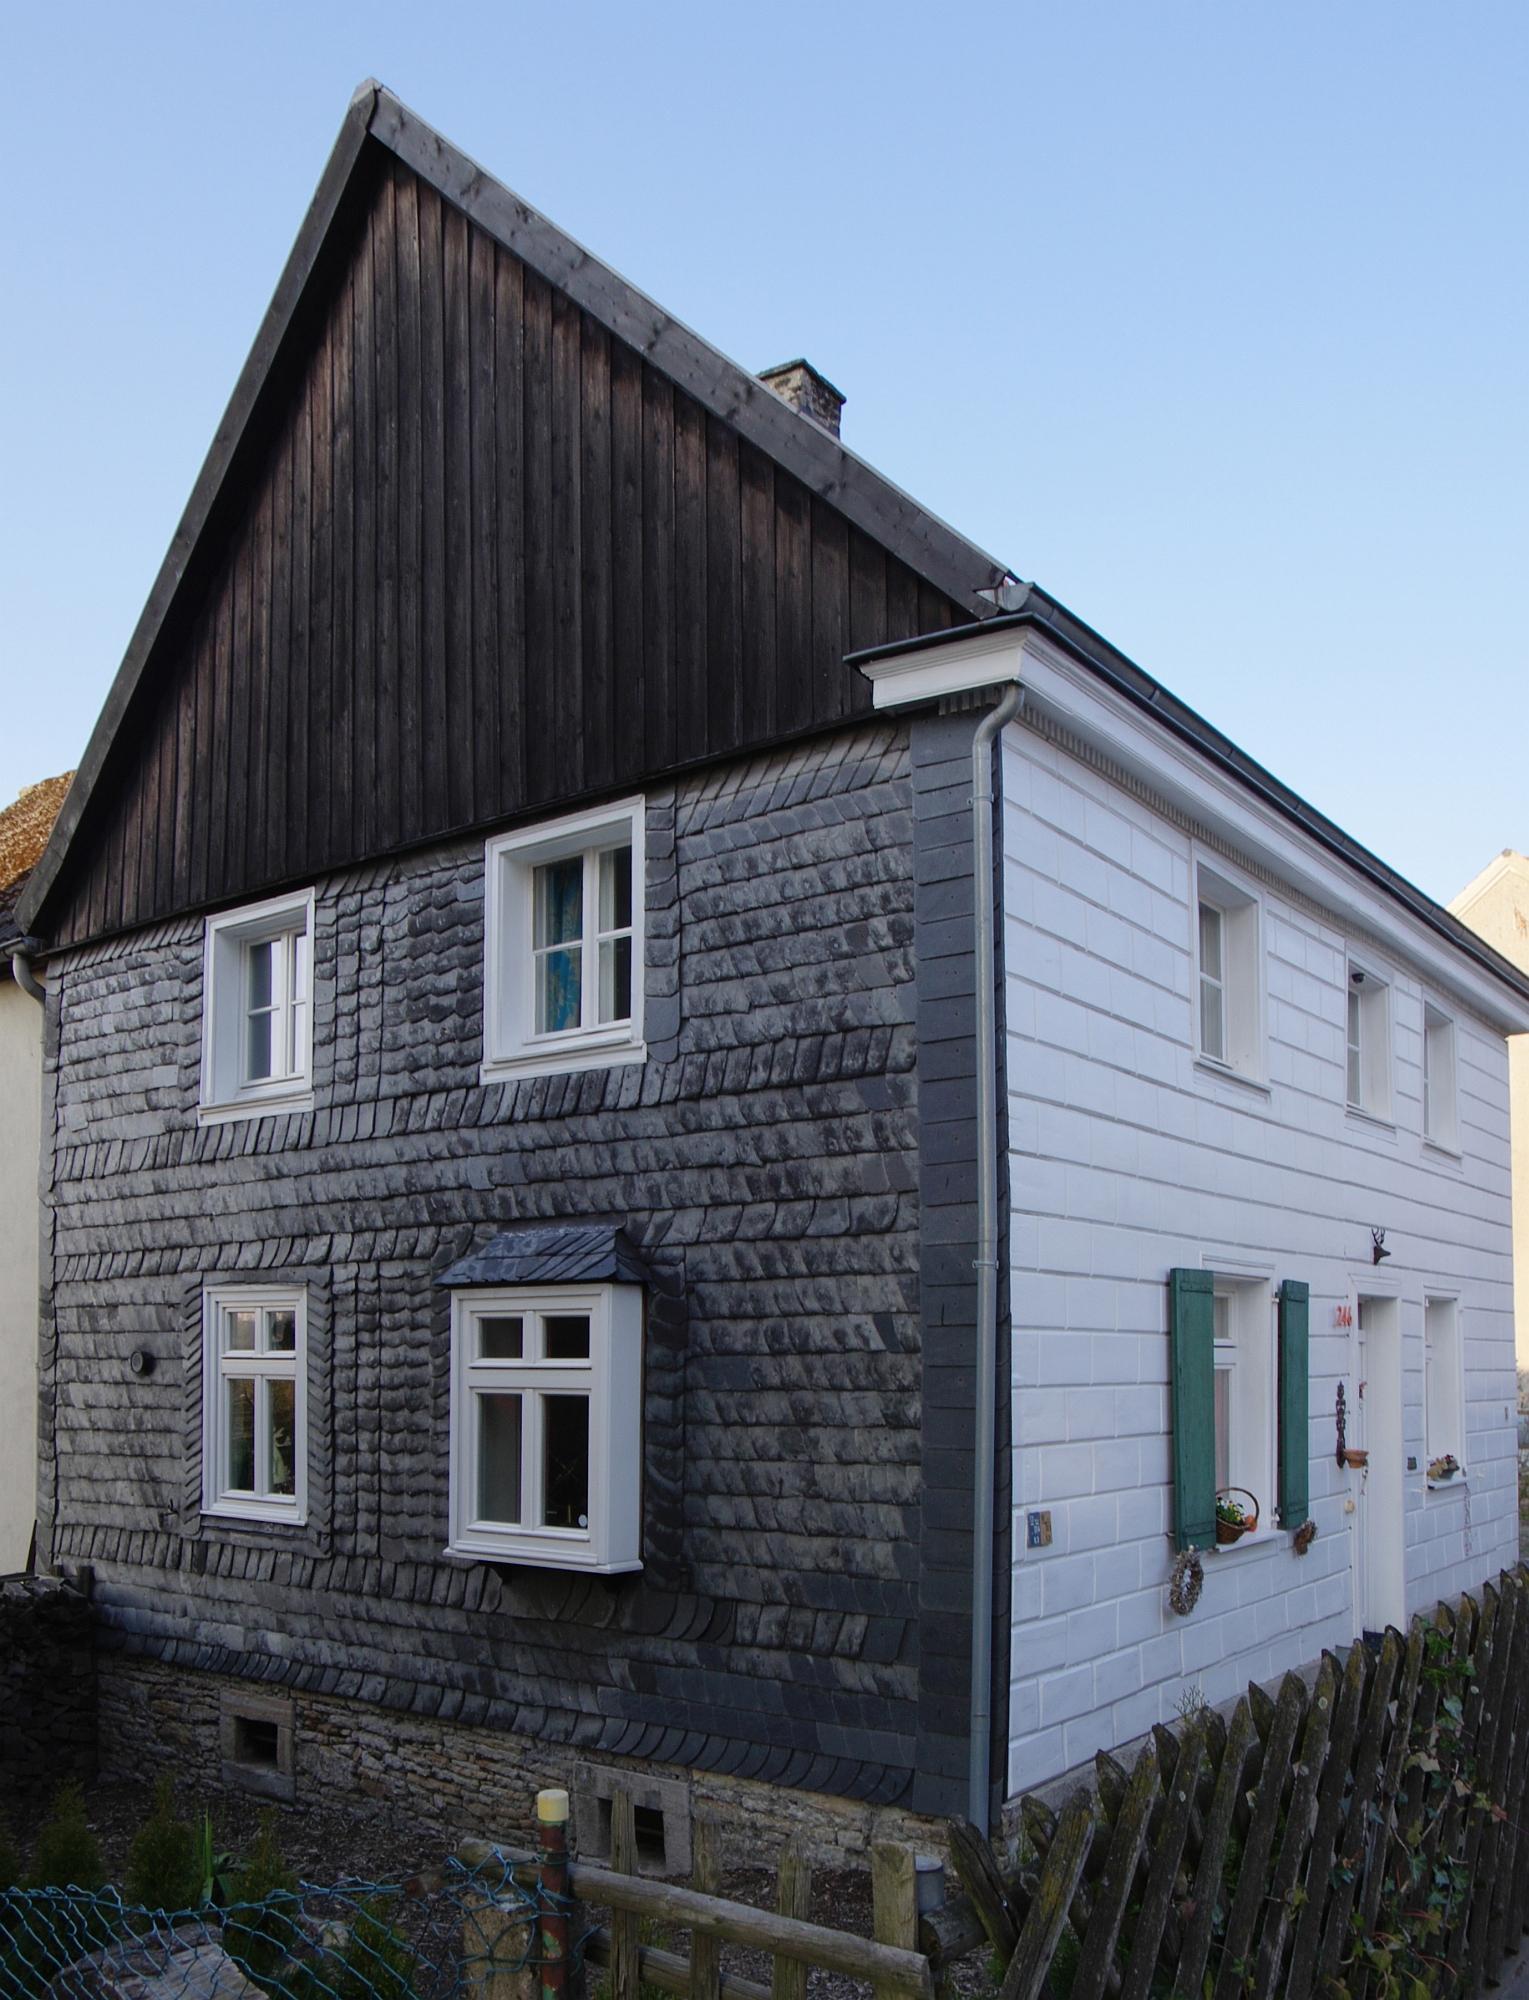 file dortmund baudenkmal stadtbezirk aplerbeck imgp0880 wikimedia commons. Black Bedroom Furniture Sets. Home Design Ideas